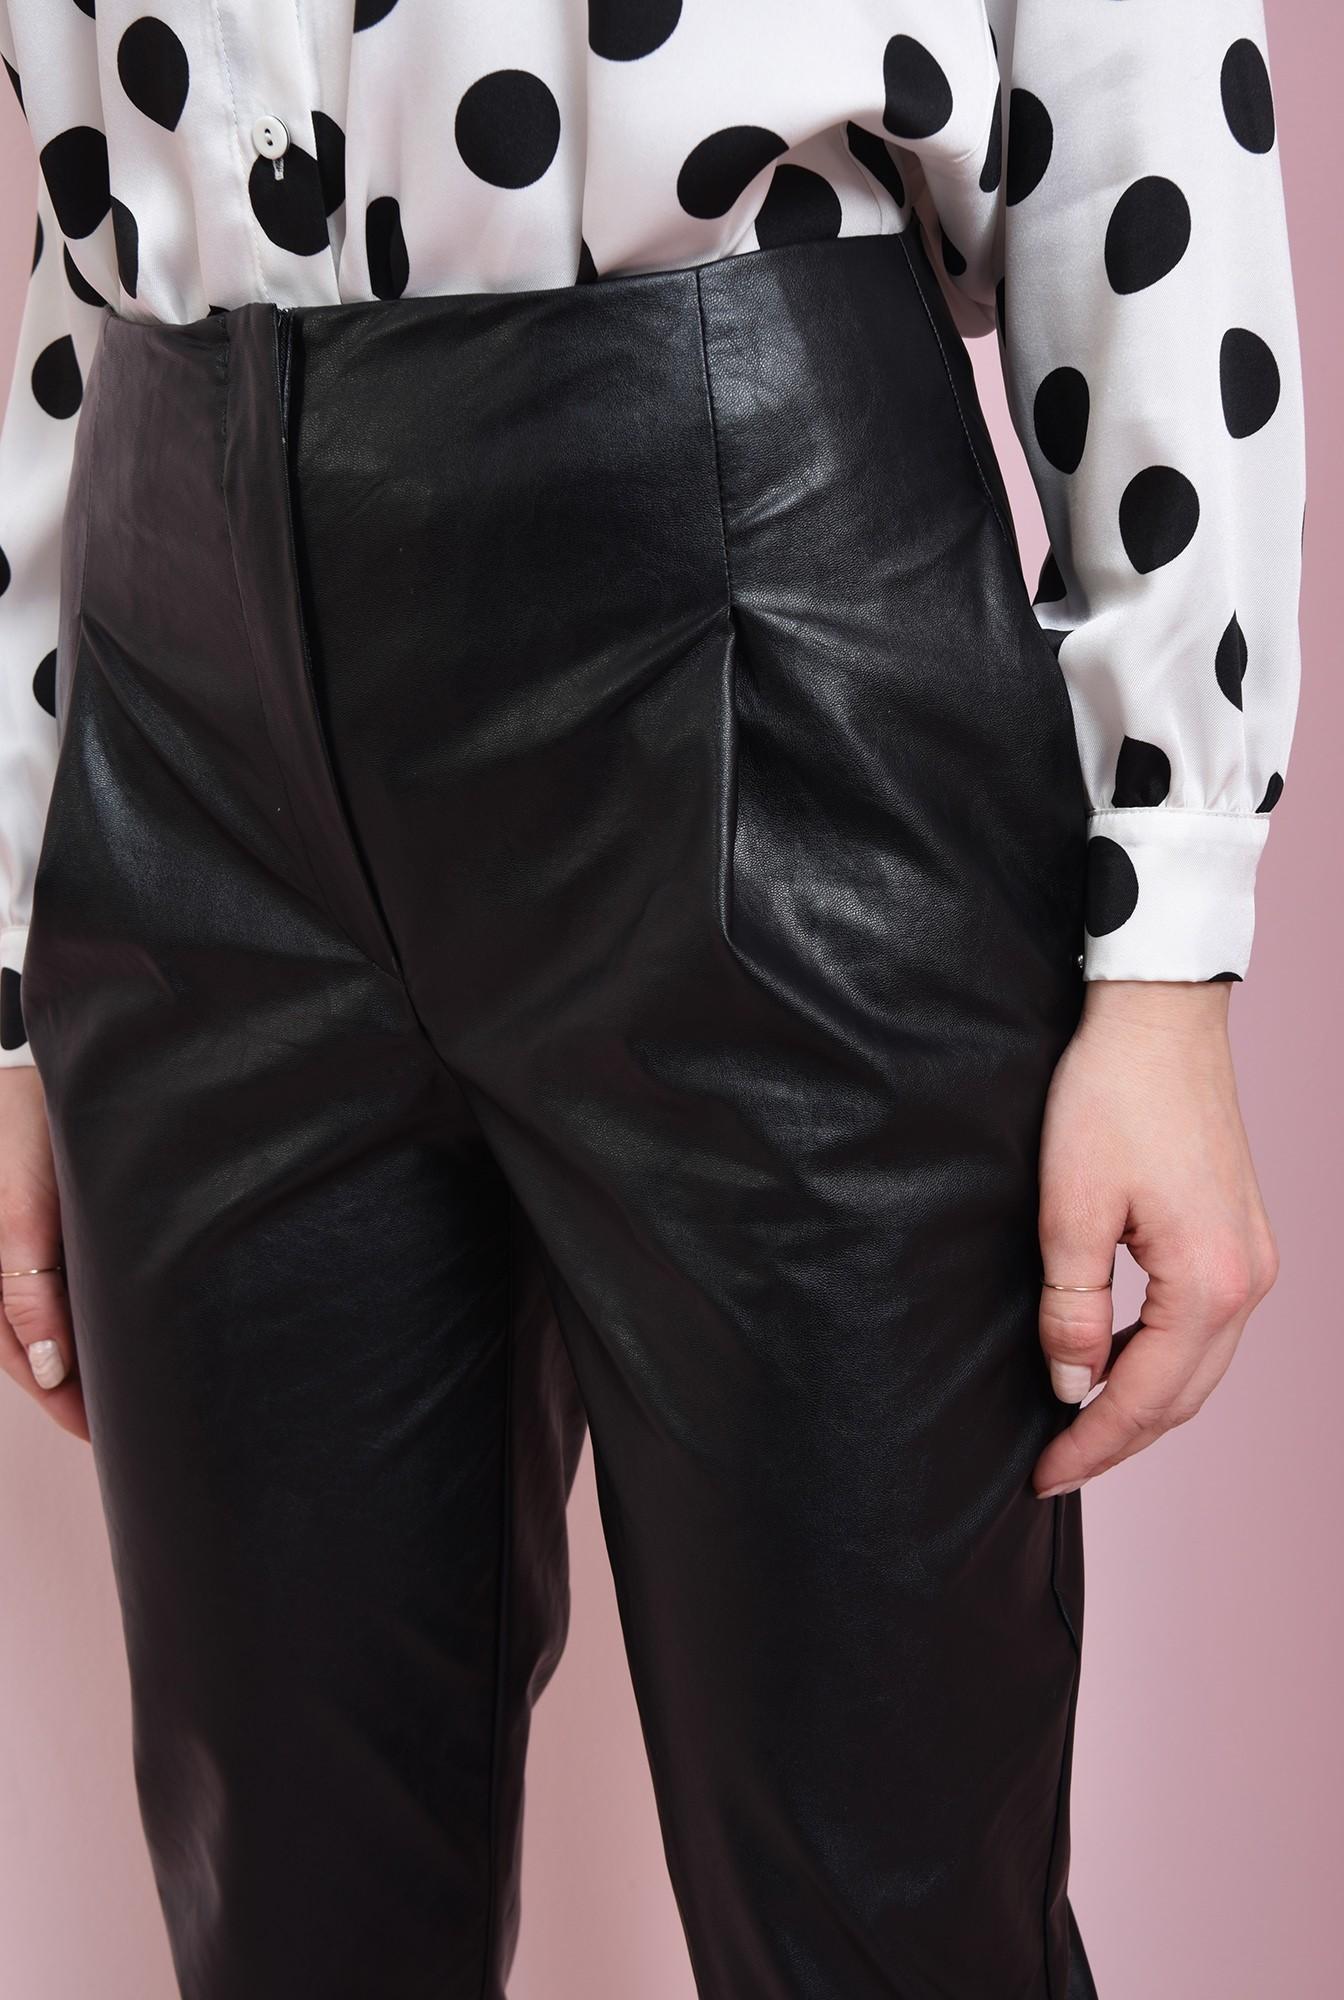 2 - pantaloni cu manseta, cu buzunare laterale